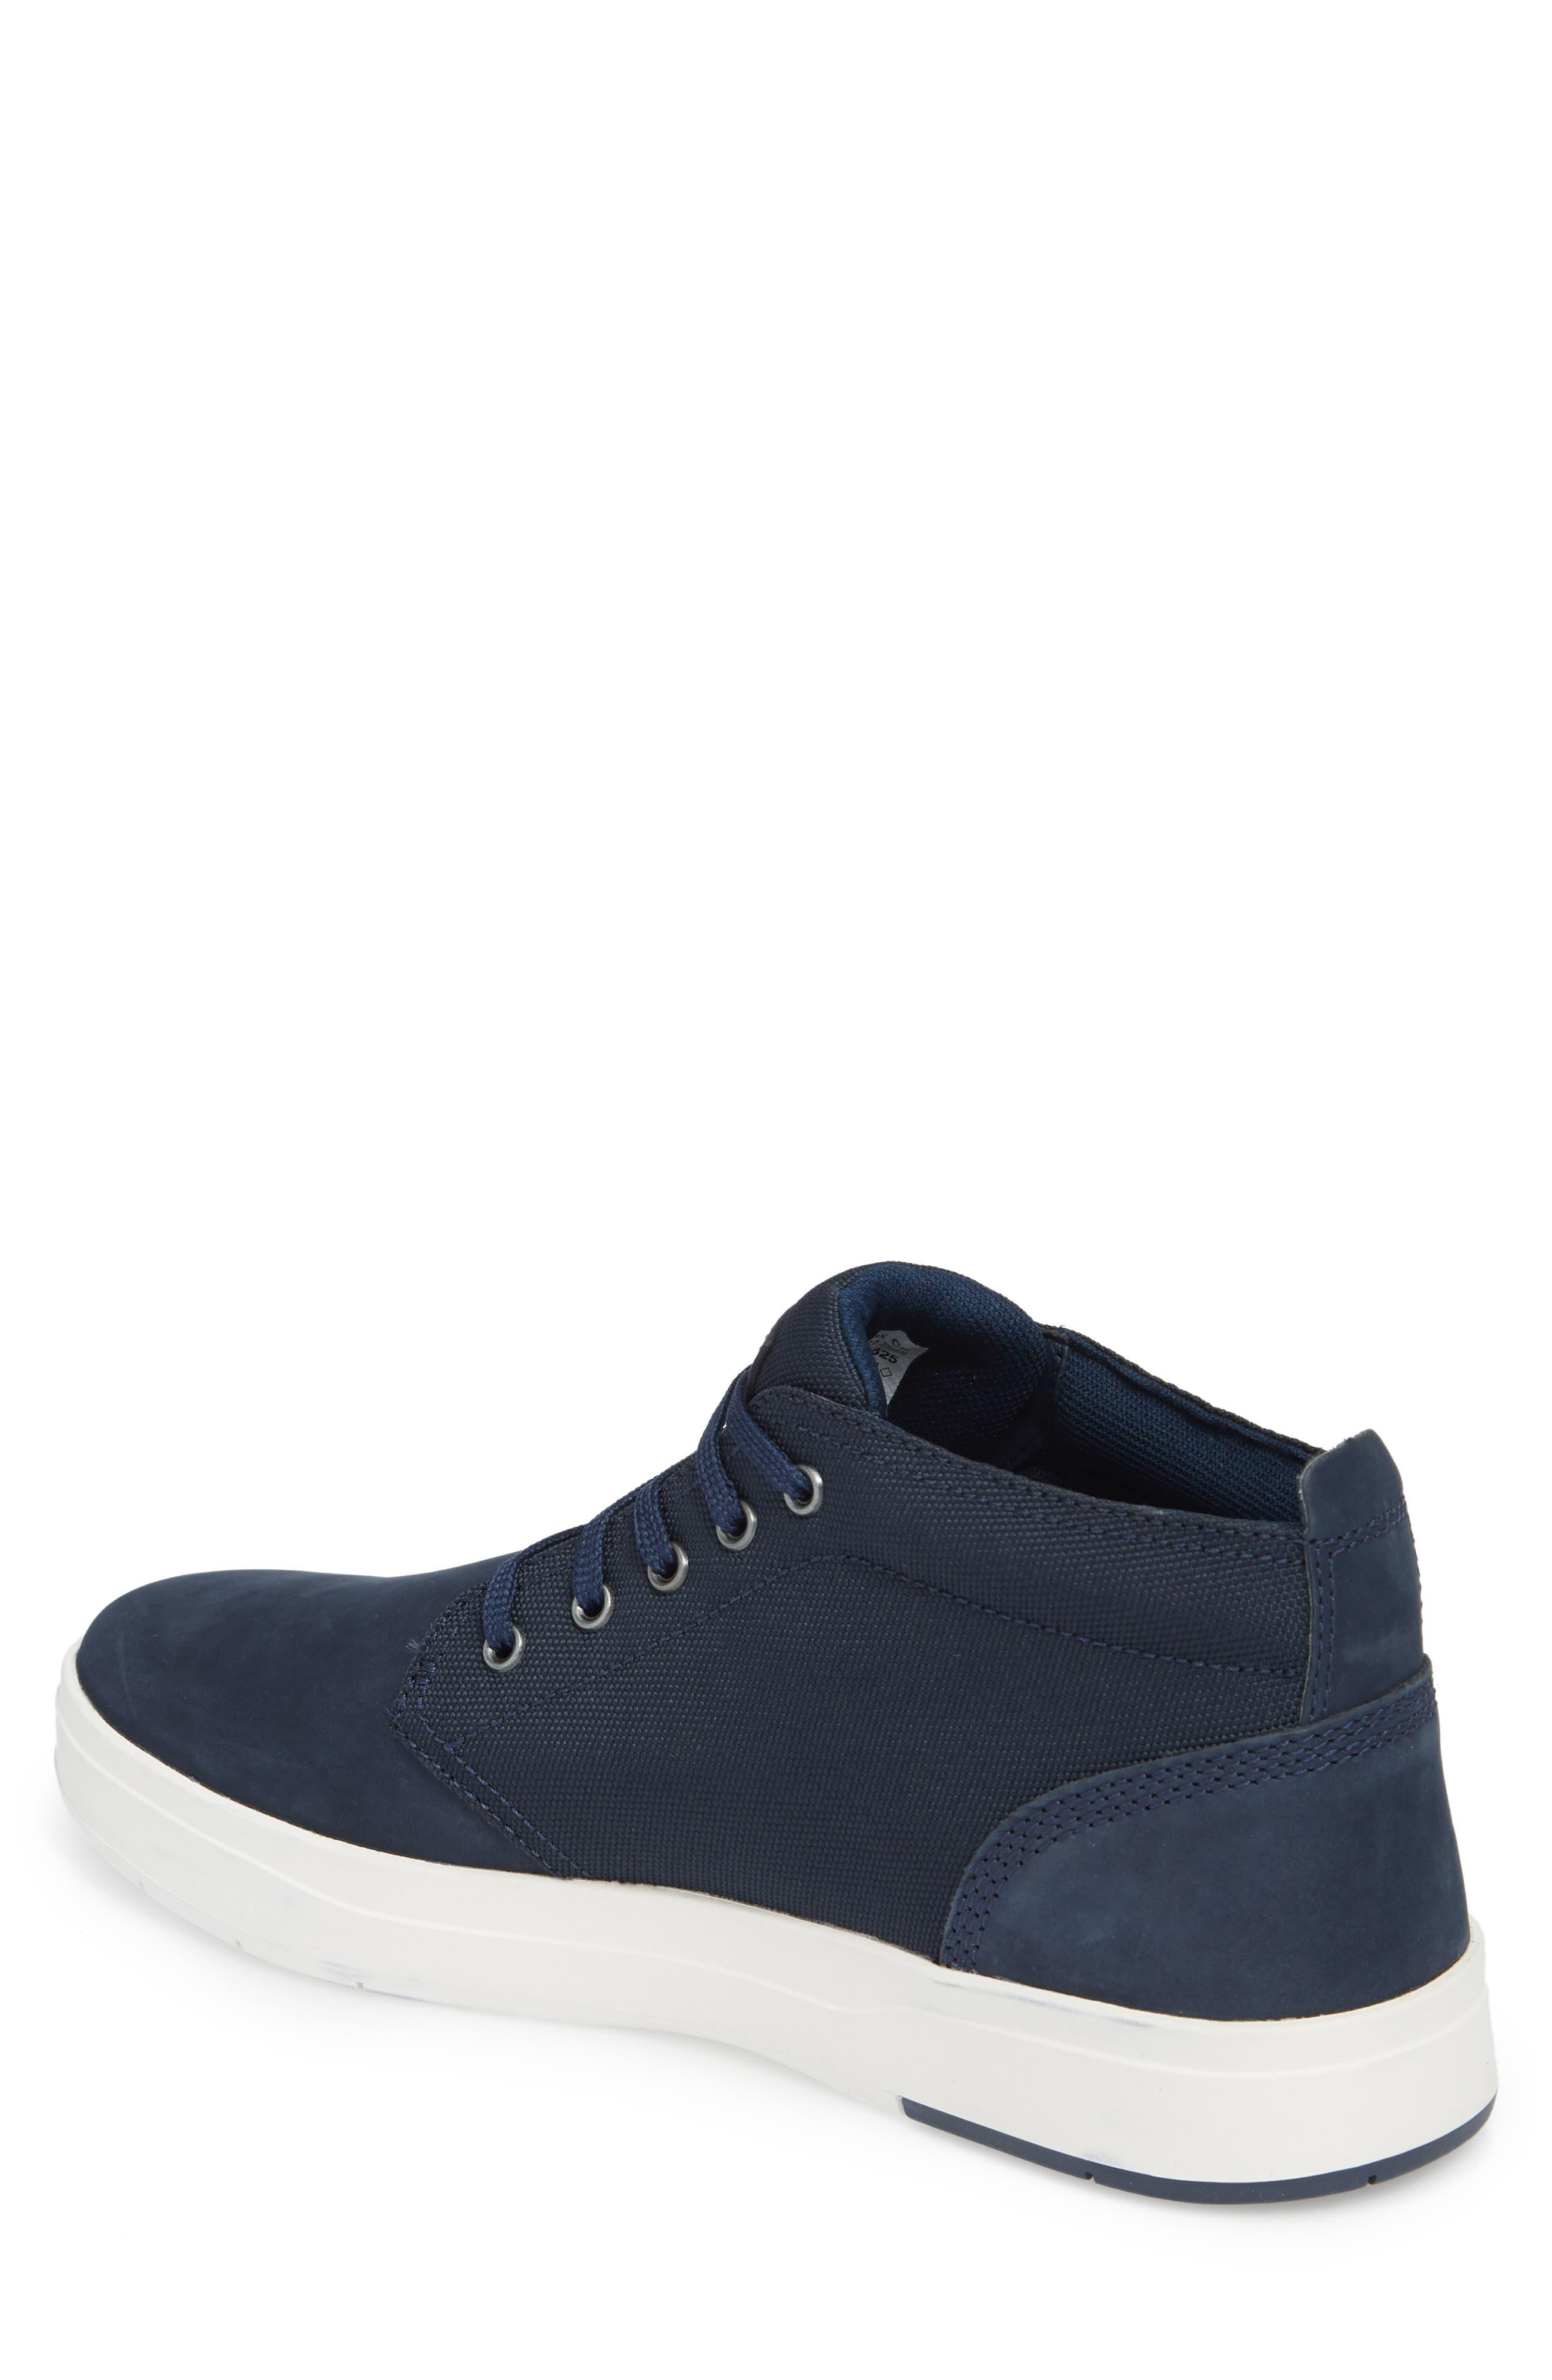 Davis Square Mid Top Sneaker,                             Alternate thumbnail 2, color,                             BLACK/ BLUE